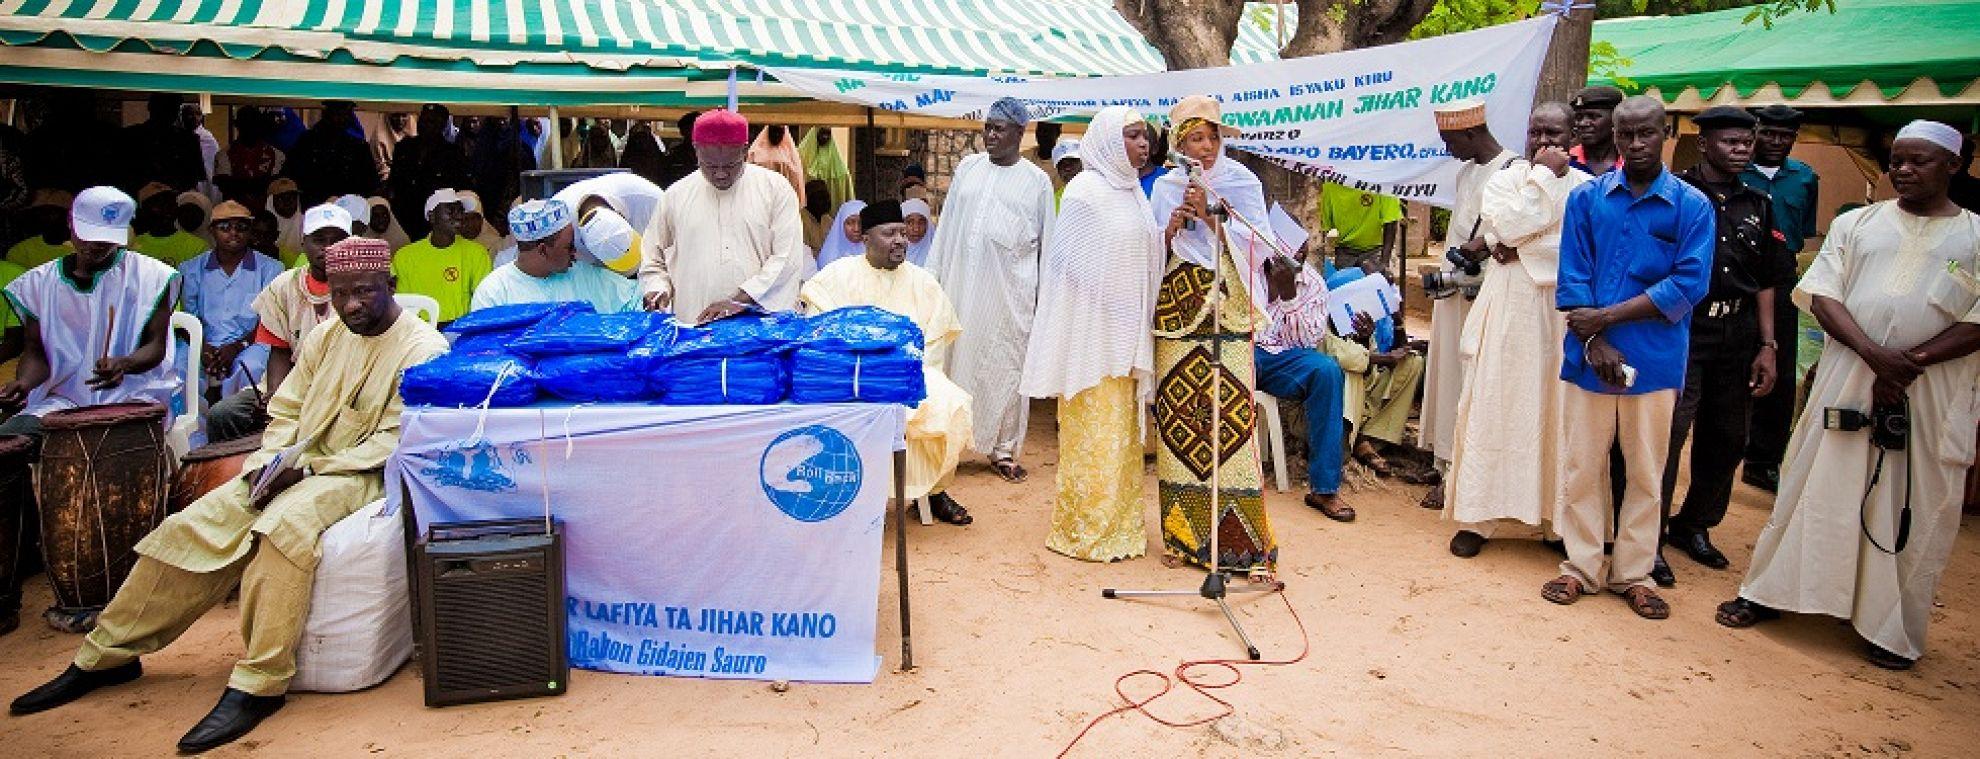 Latest News Bill gates commits to eradicate malaria in his lifetime